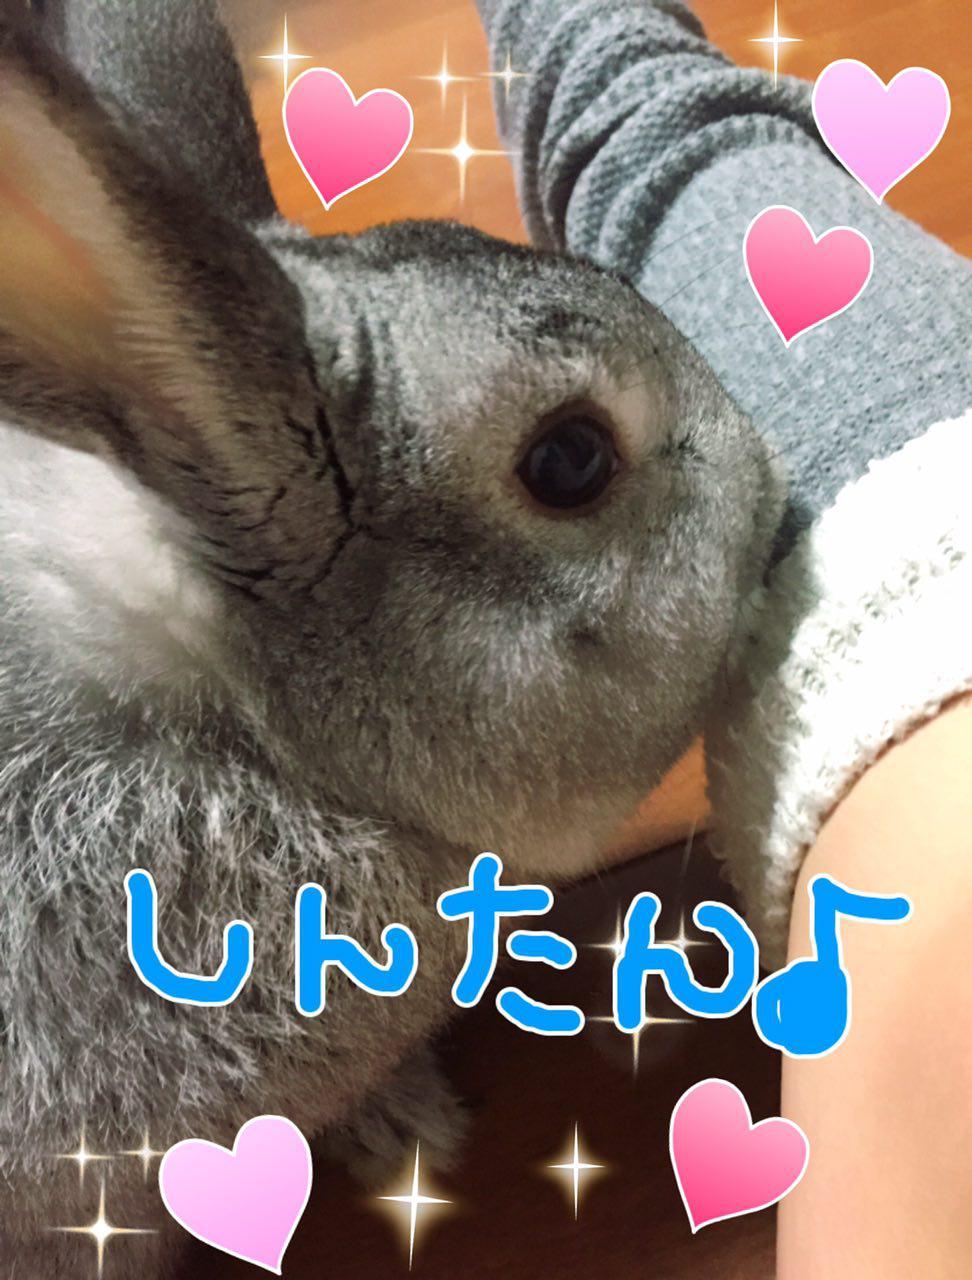 photo_2017-03-05_01-28-16.jpg